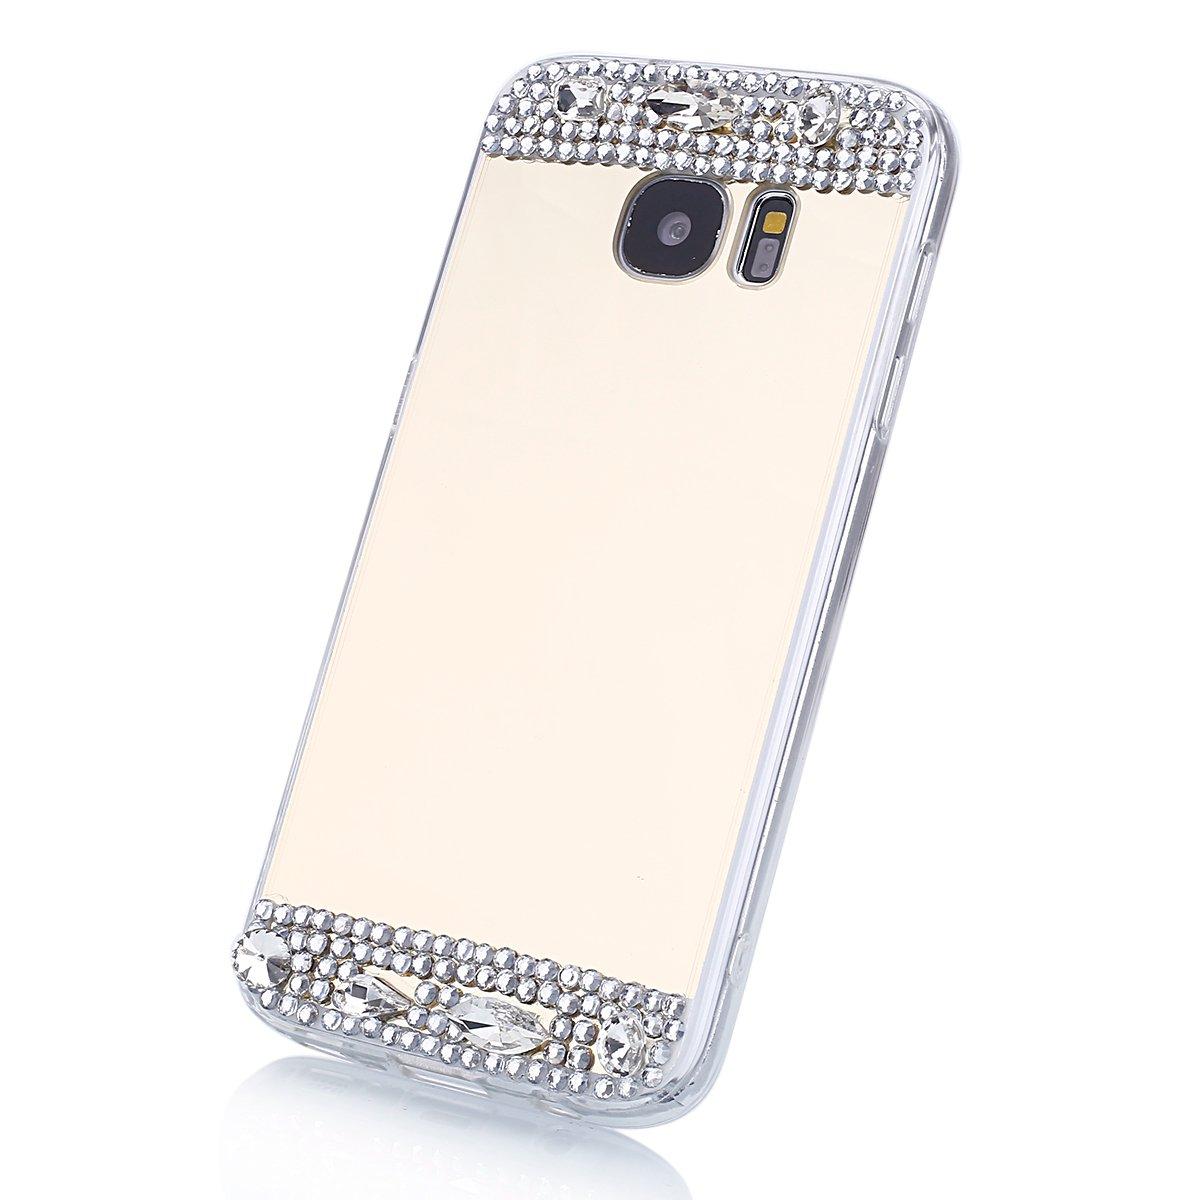 EINFFHO Silicone Miroir Coque Samsung Galaxy S6 Edge Plus Protector Bumper Strass Diamant Briller Soft Silicone R/éfl/échissant Placcatura Miroir Housse /Étui pour Samsung Galaxy S6 Edge Plus Or Rose